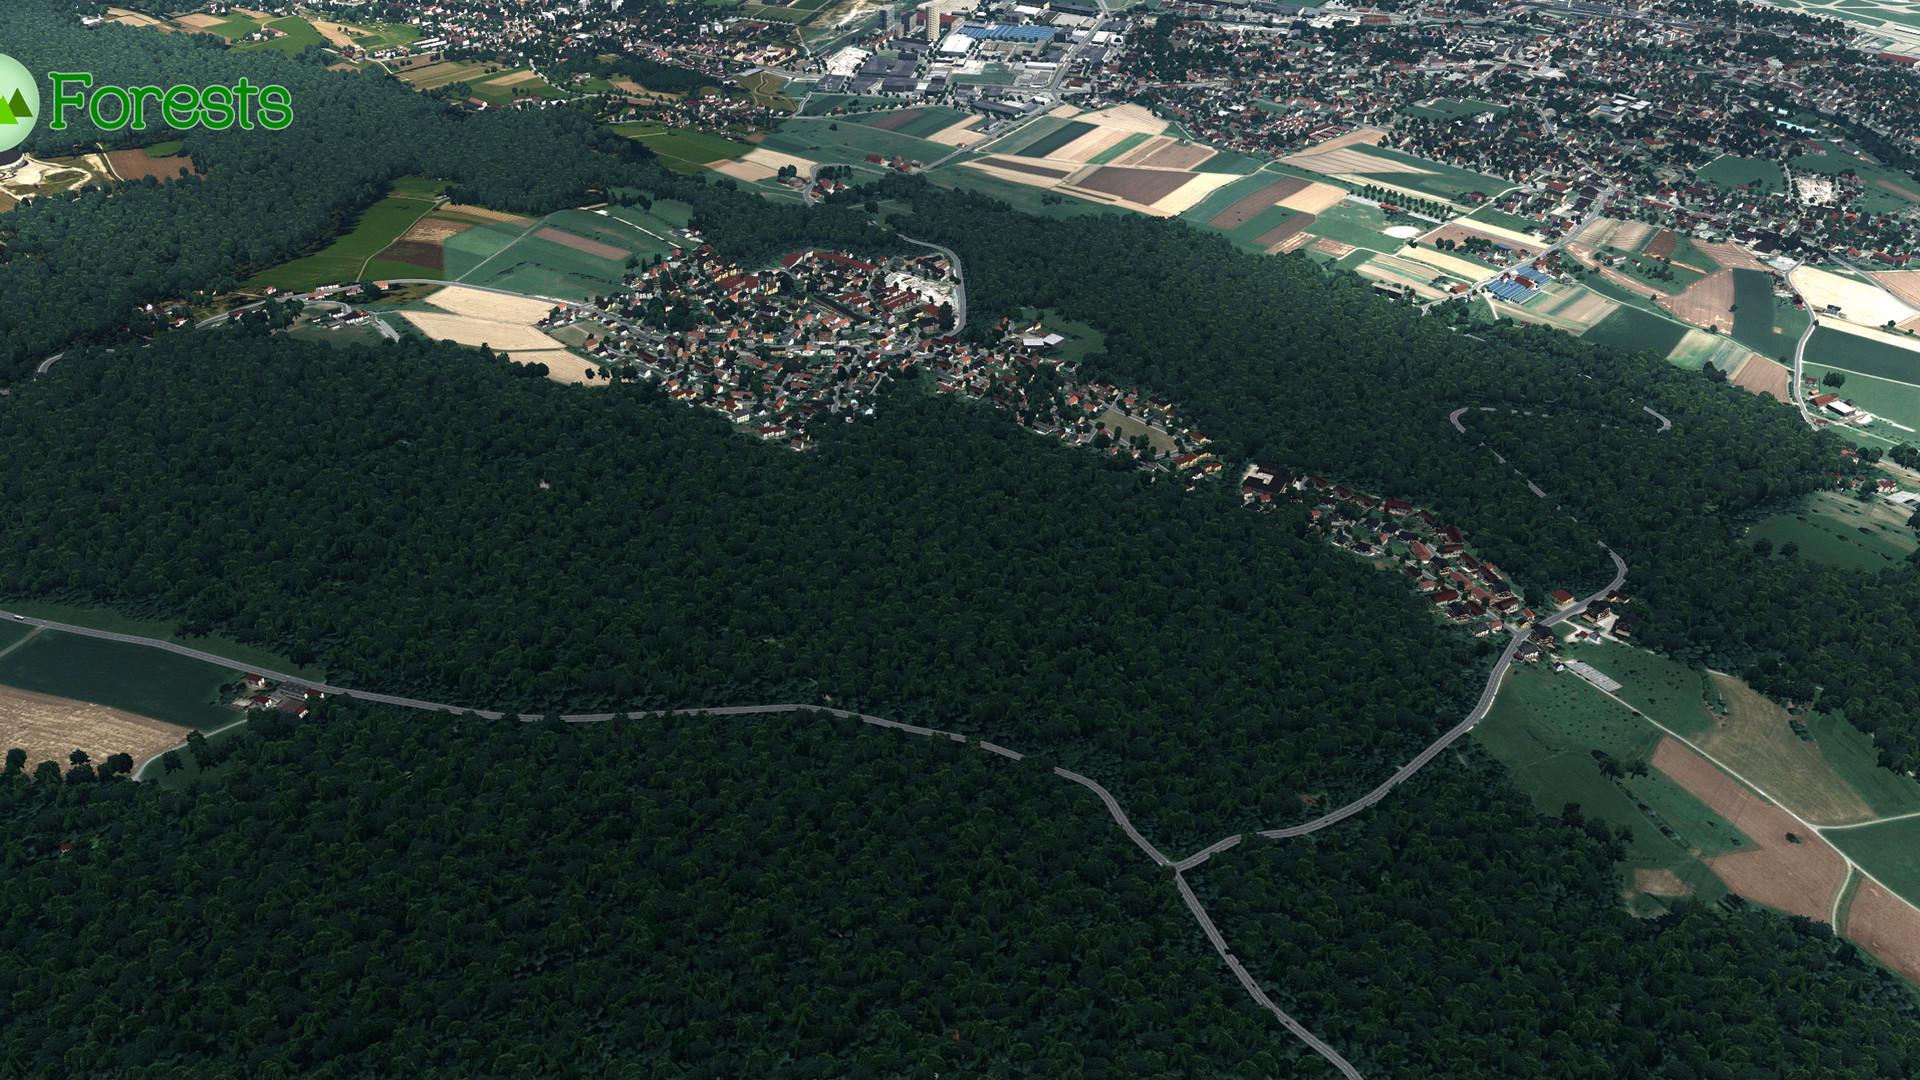 Global_Forests_Austria.jpg